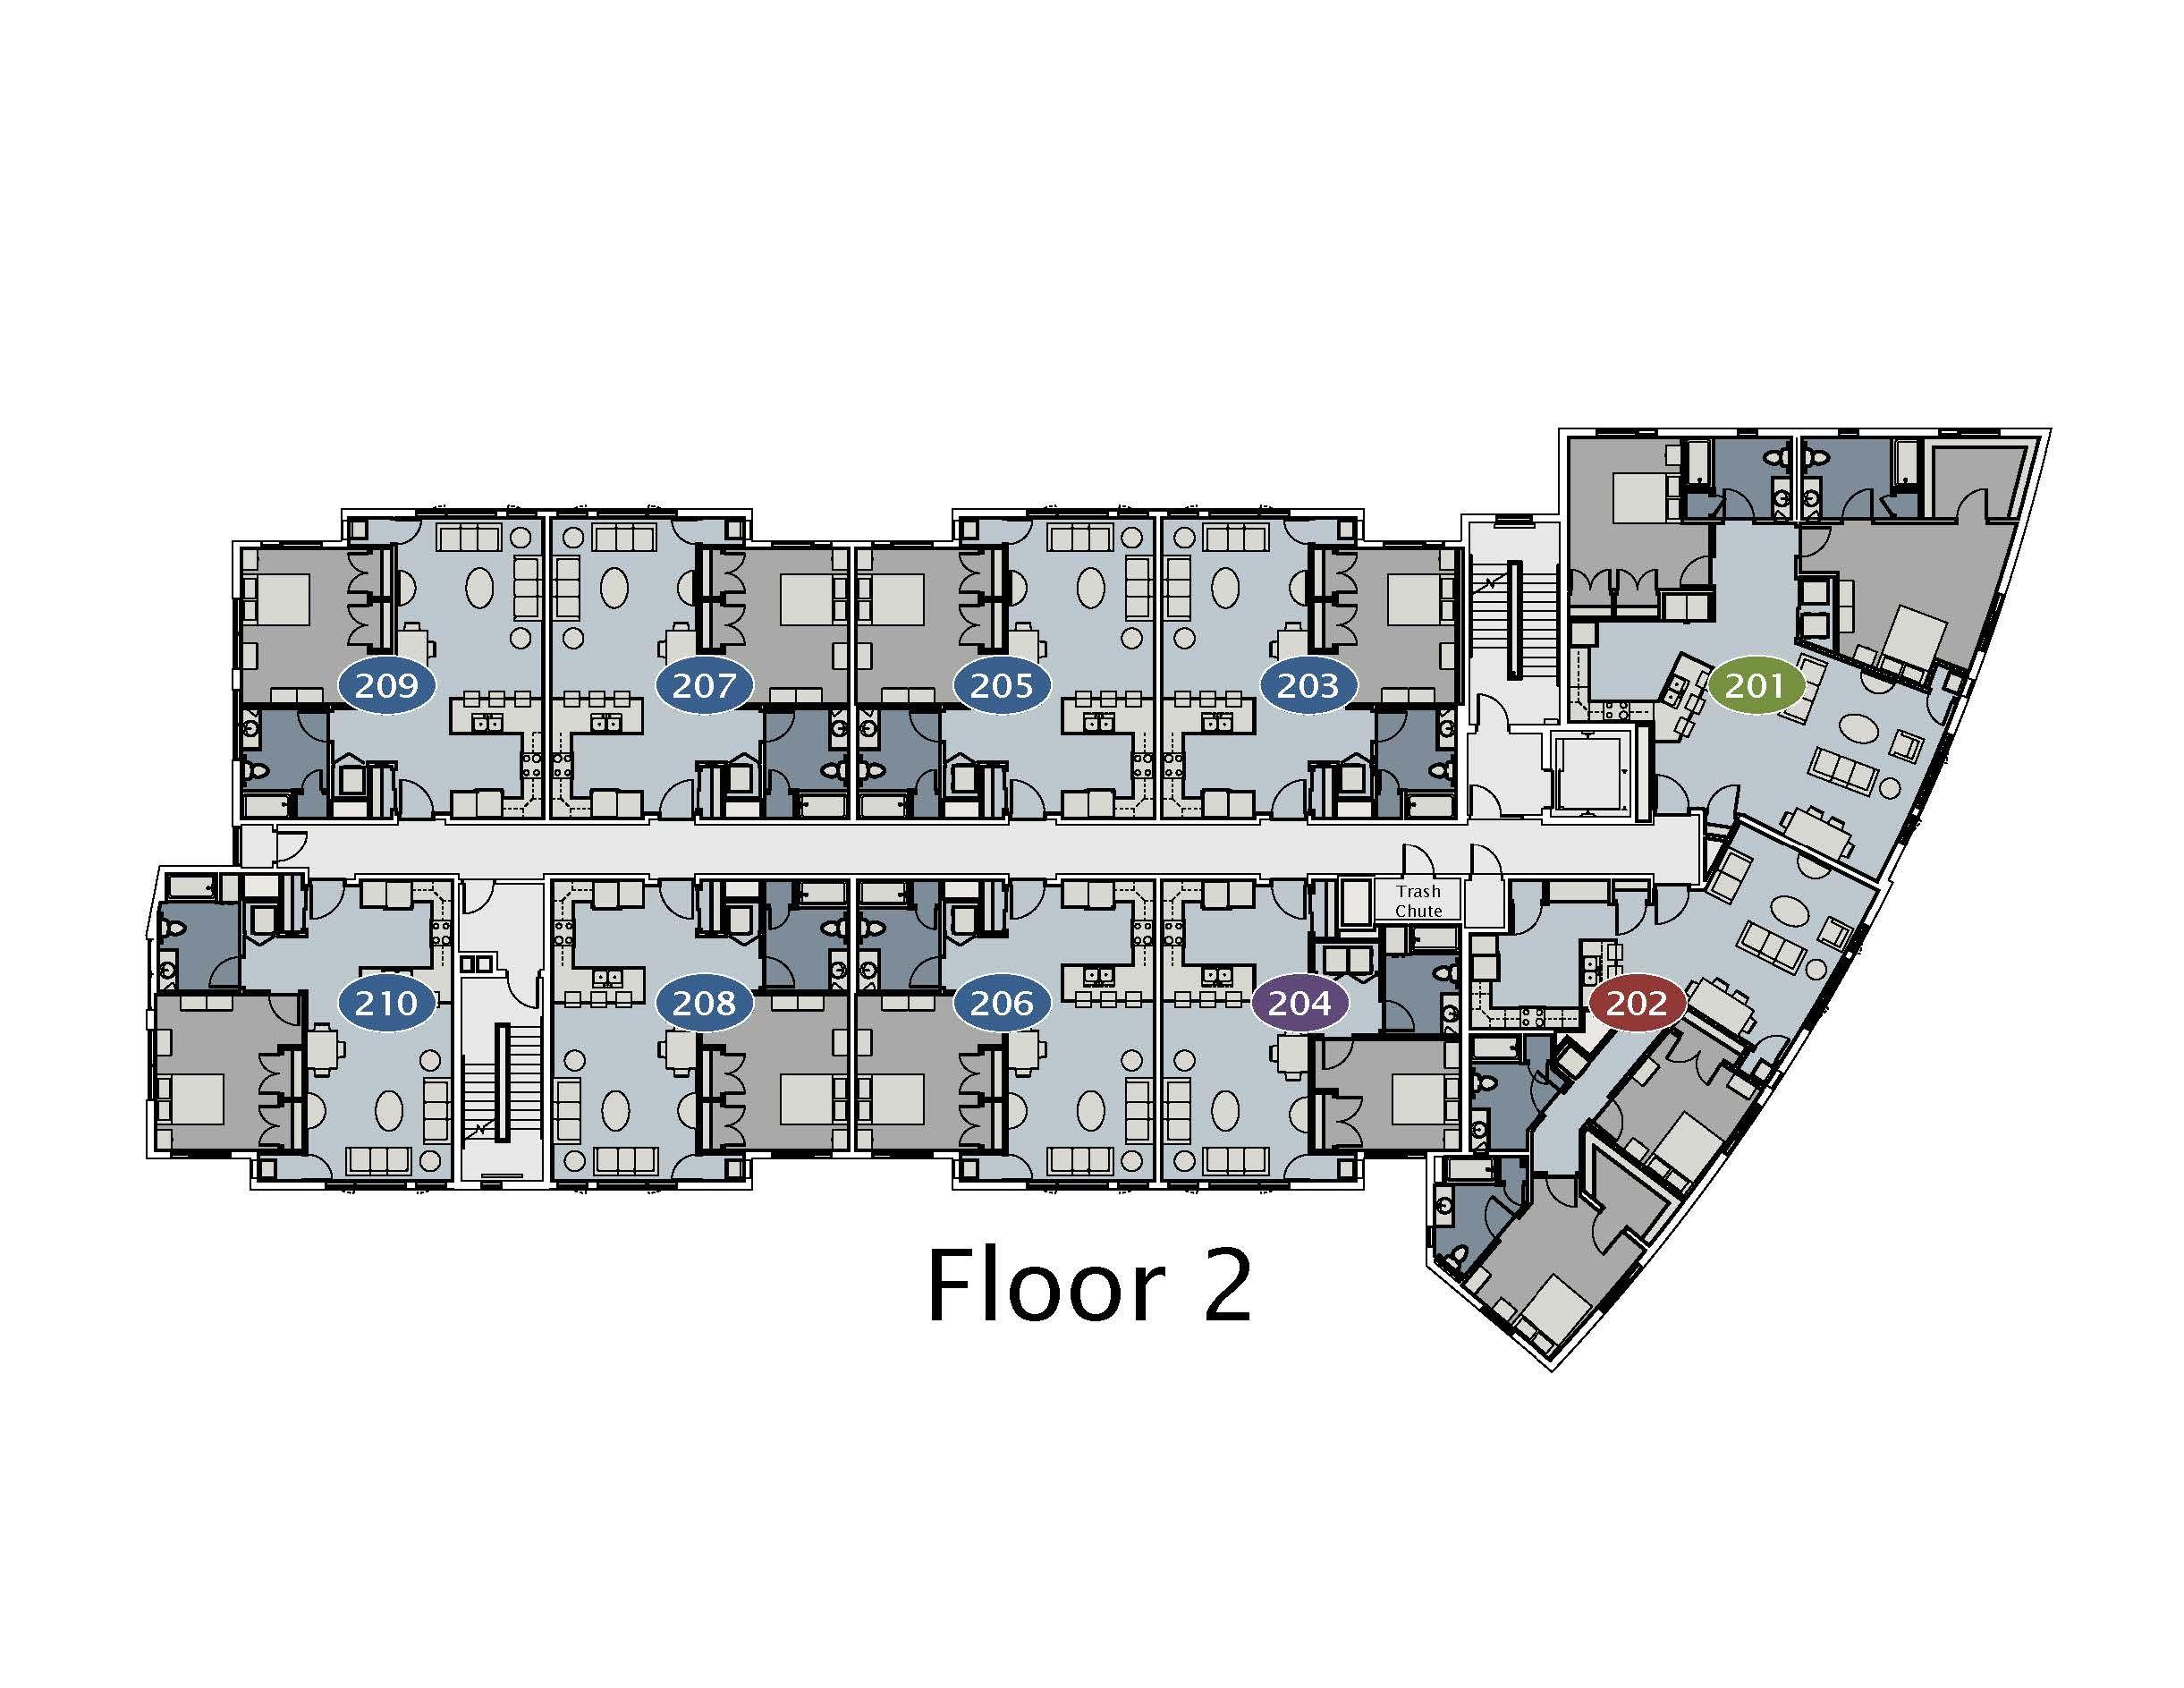 Home Plans Design Apartment Complex Floor Floor Plan Design Floor Plans How To Plan